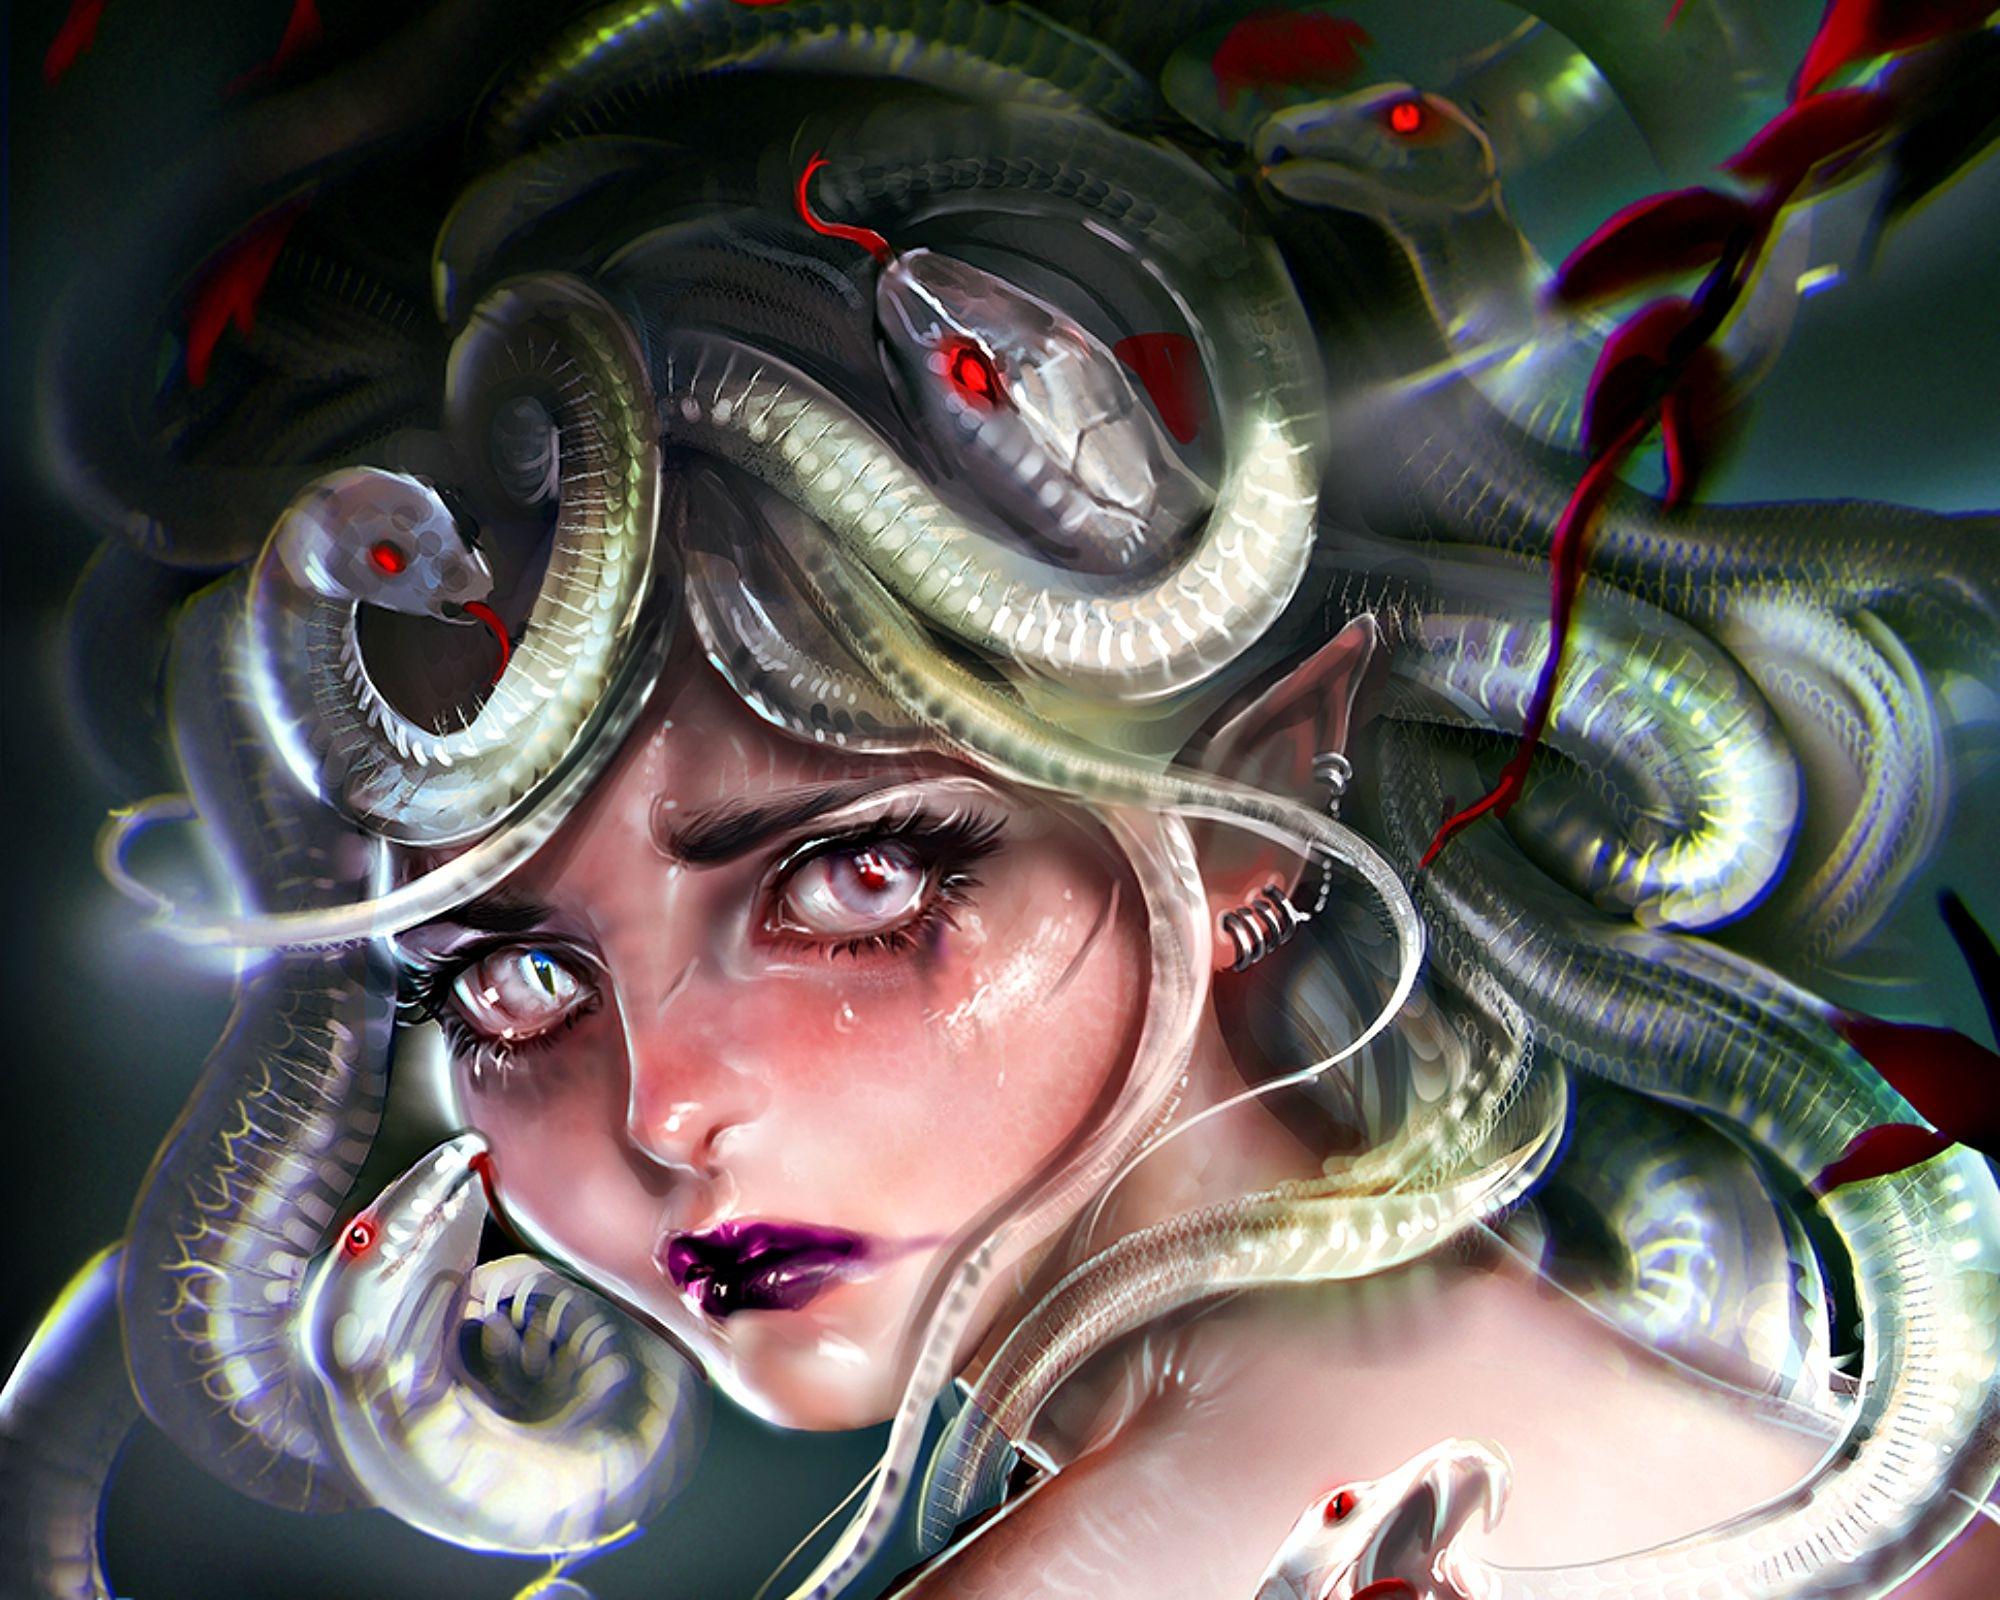 Medusa - fantasia wallpaper (39088193